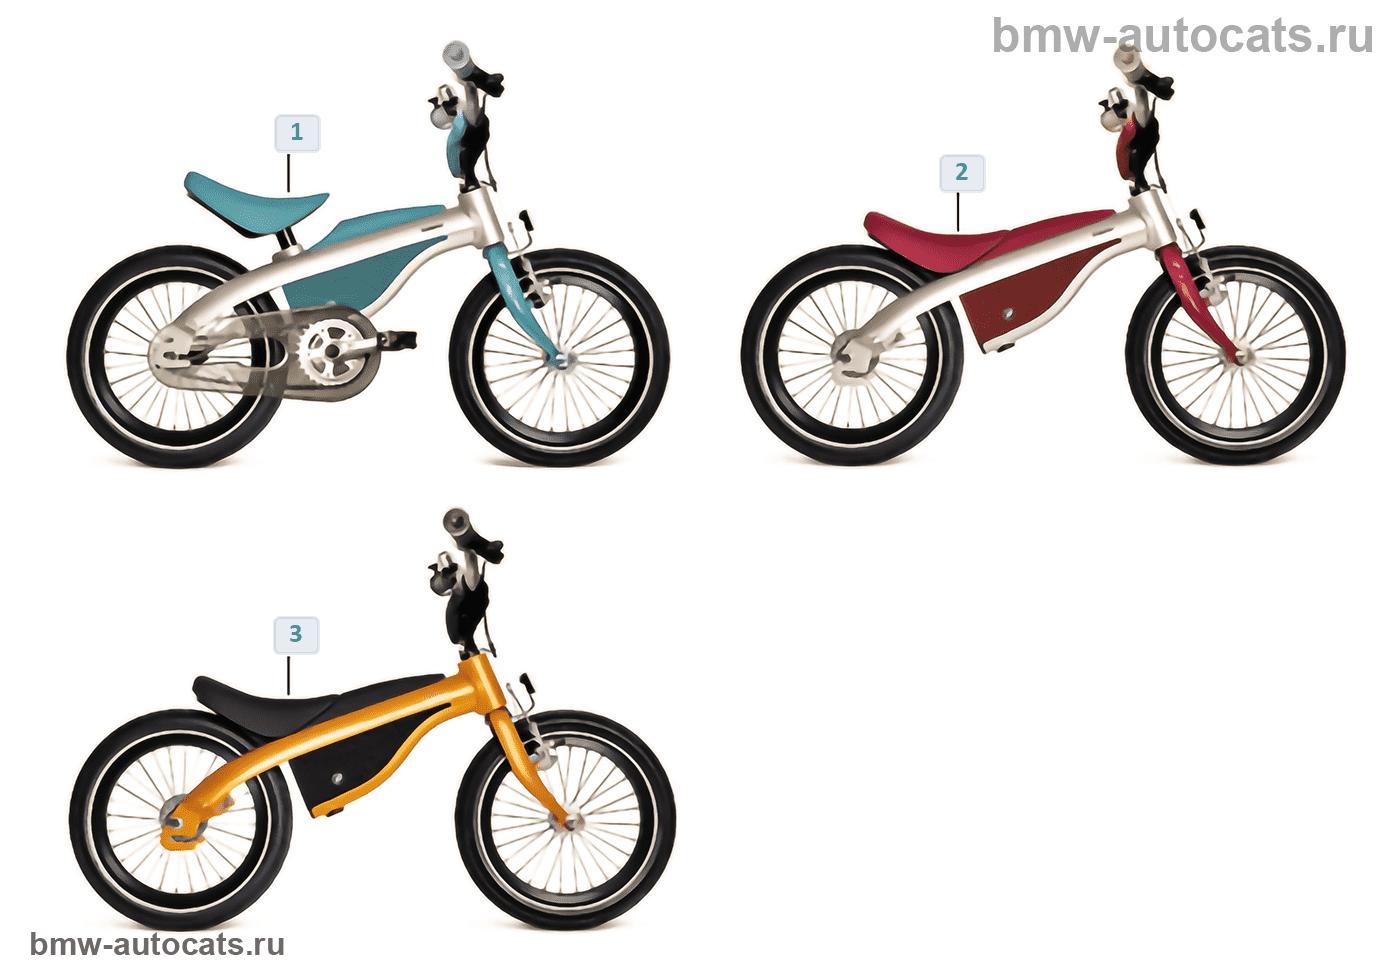 Детская прогр. BMW, Kids Bikes 13/14